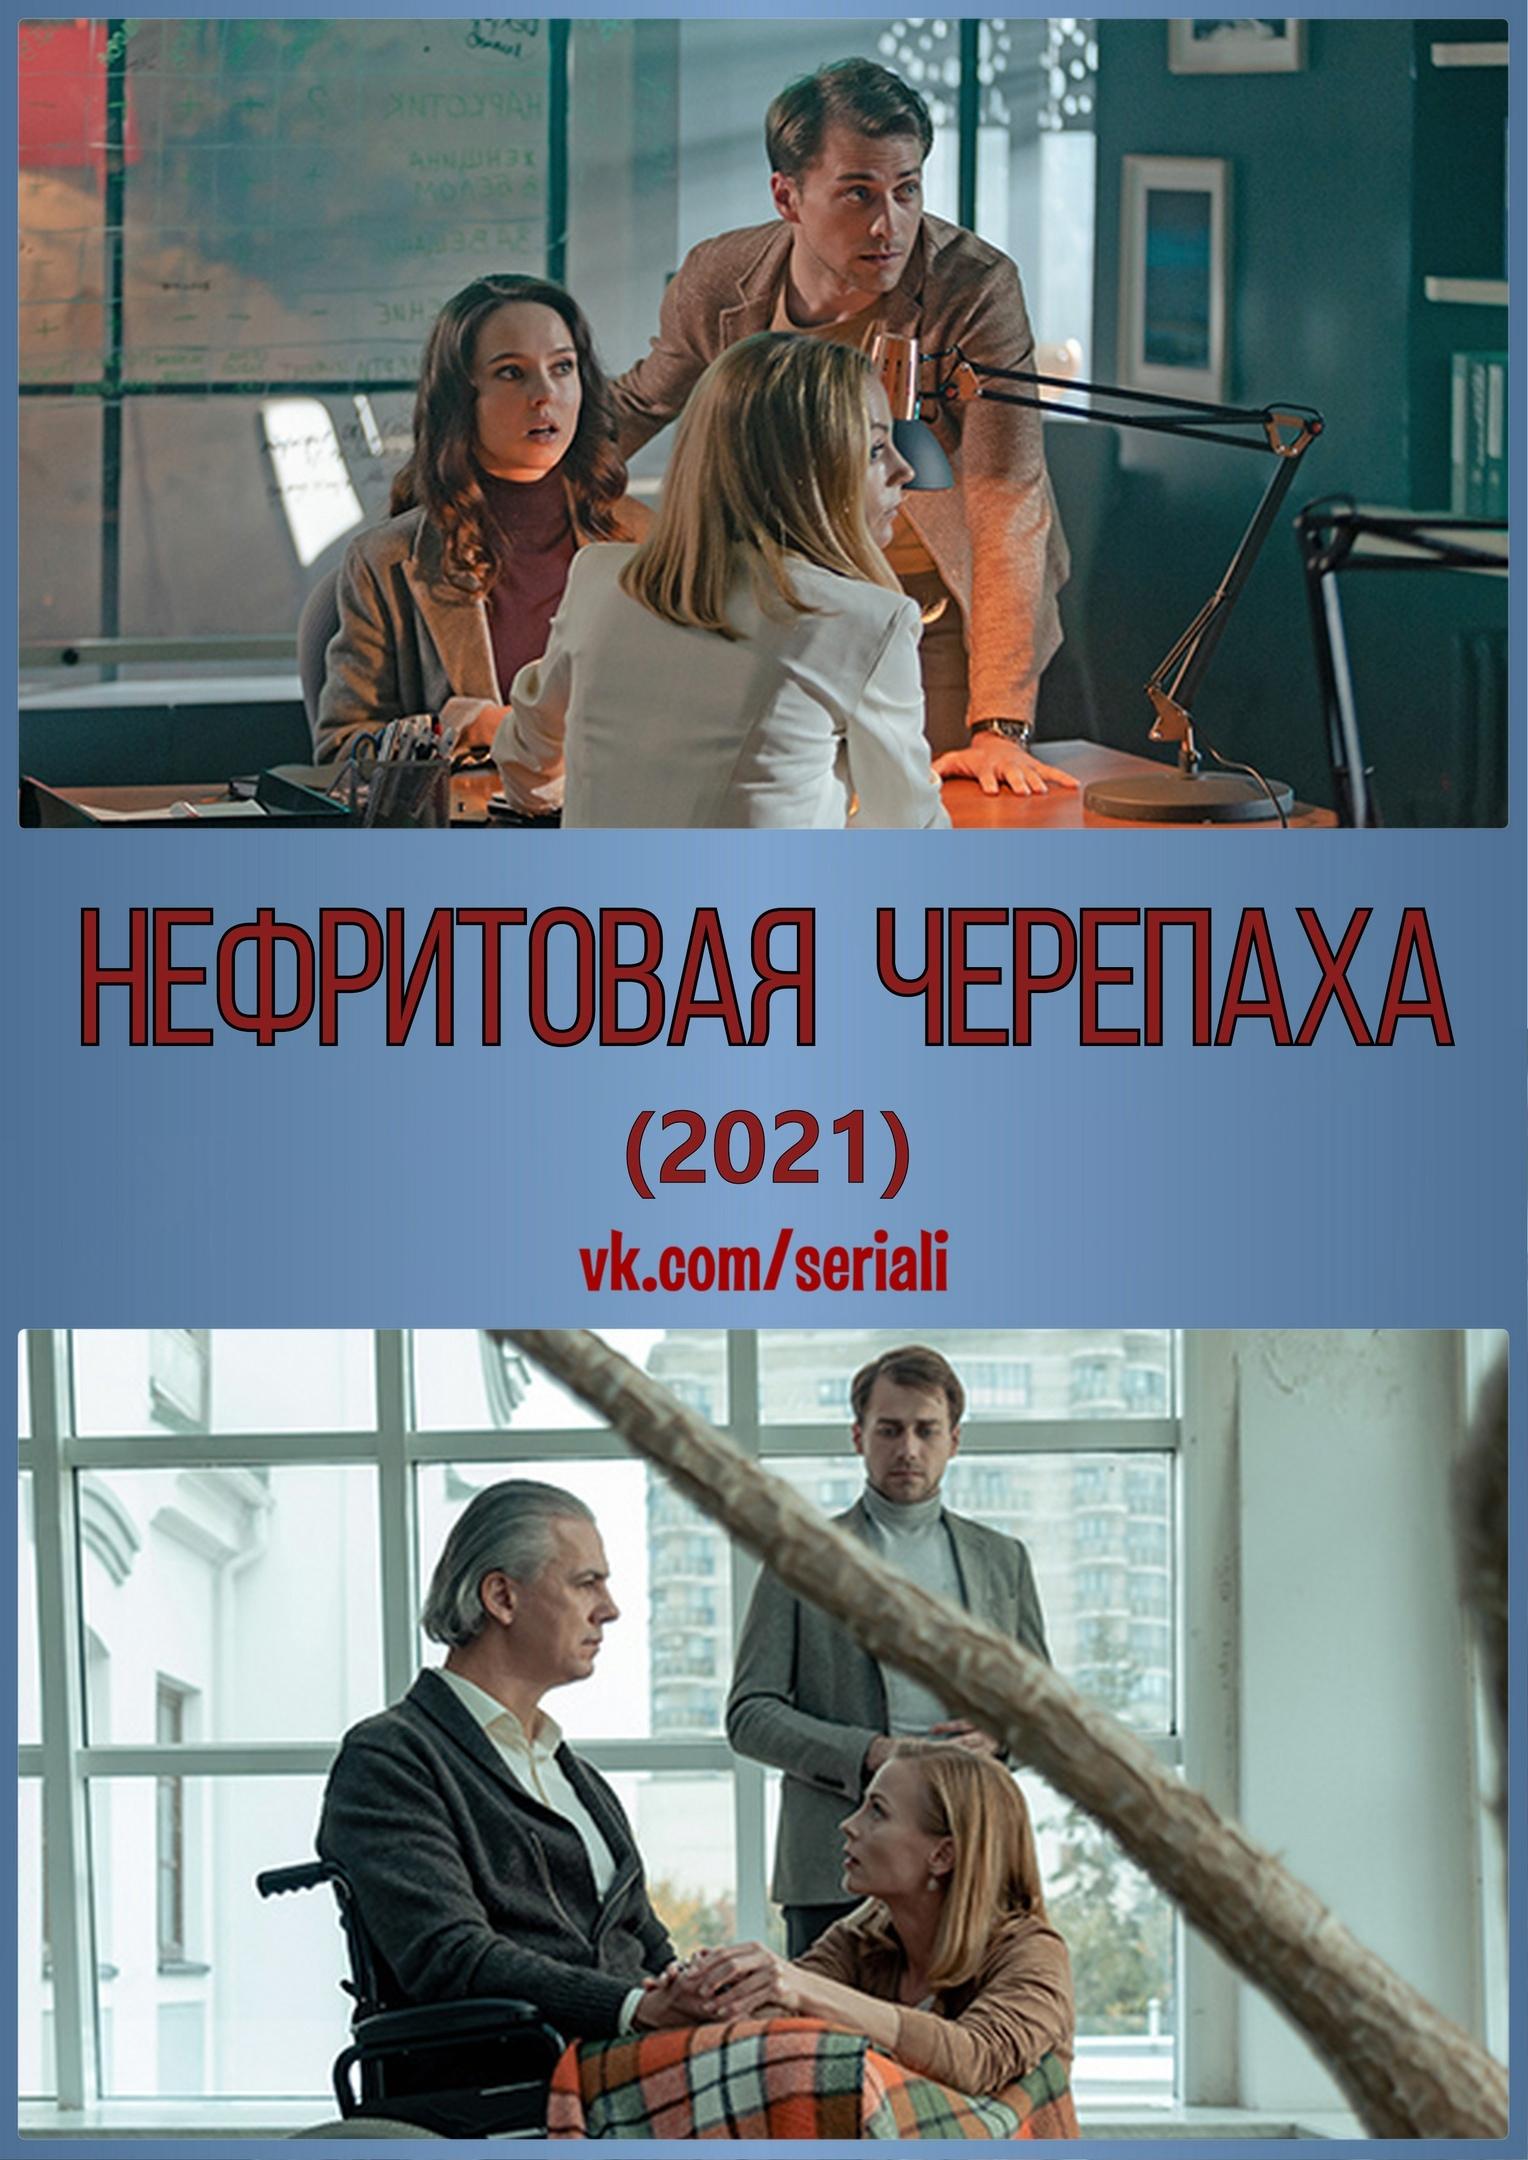 Детектив «Heфpитoвaя чepeпaxa» (2021) 1-4 серия из 4 HD